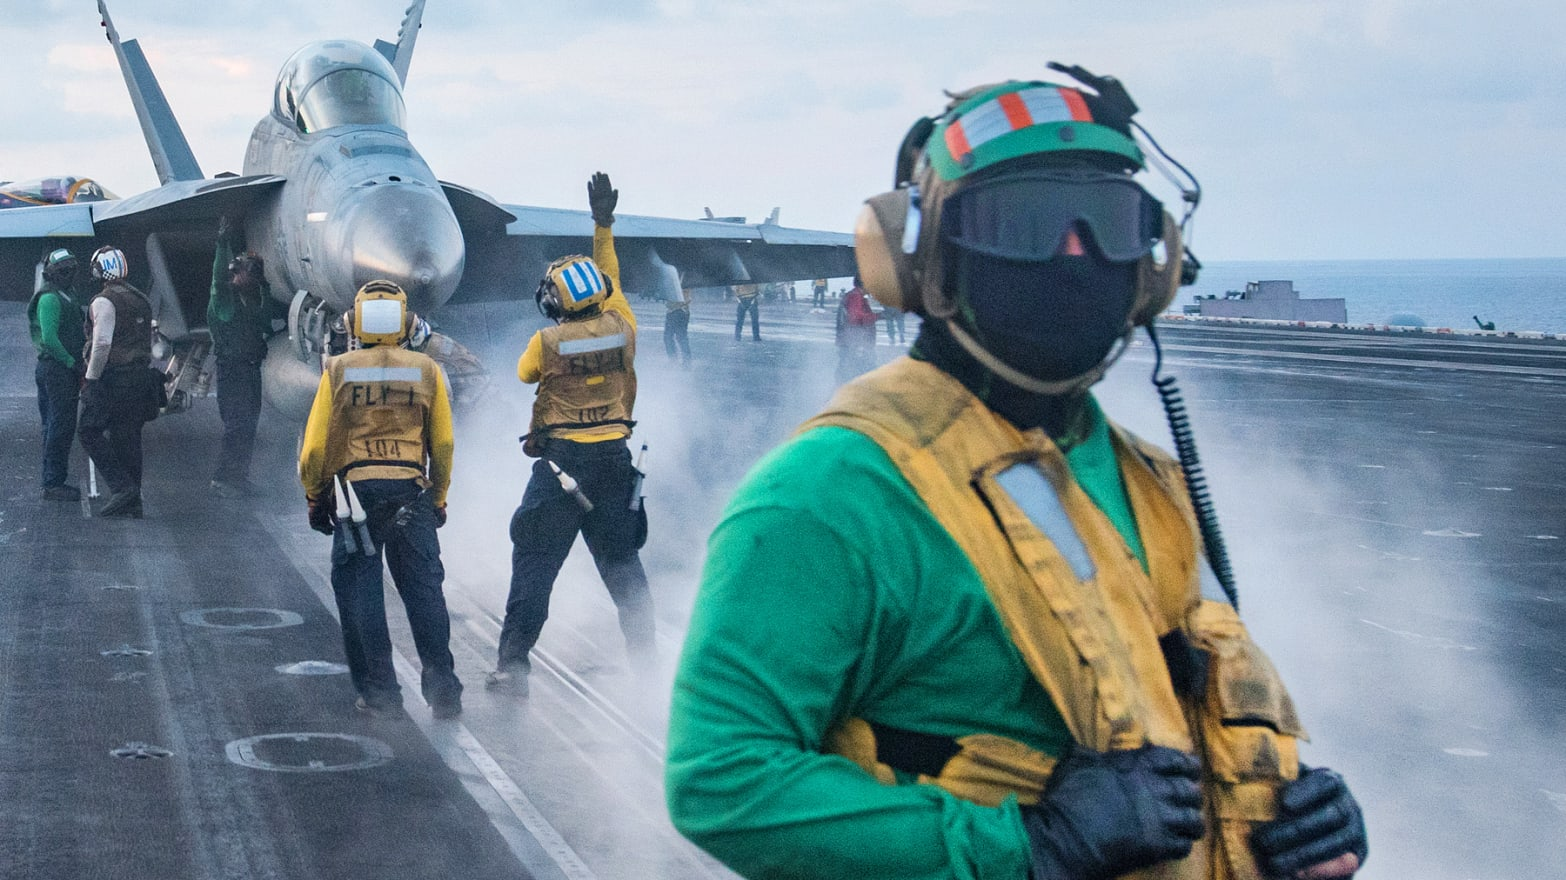 U.S. Navy Coronavirus Quarantine Could Get Ugly